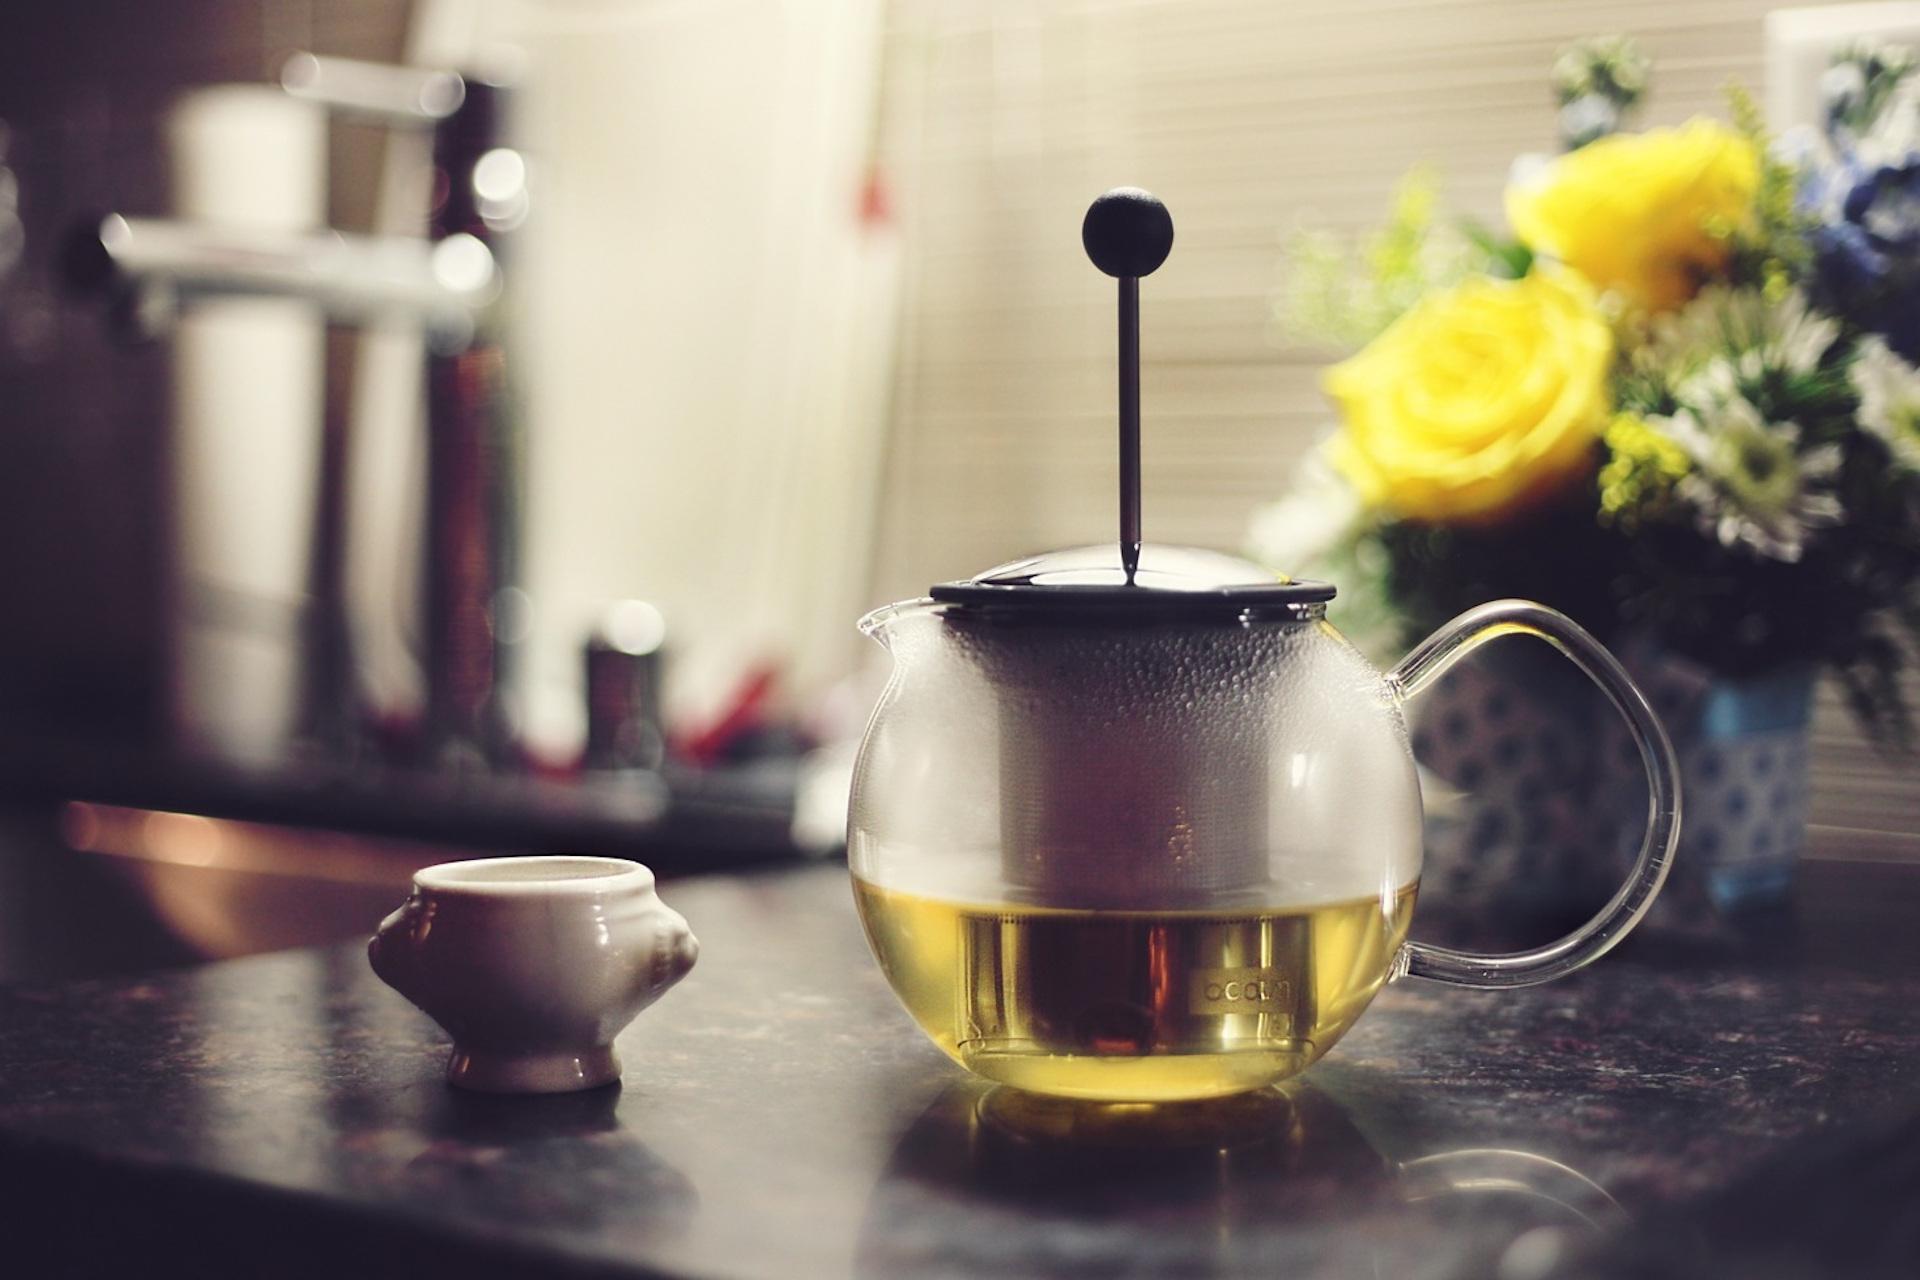 Green tea in teapot